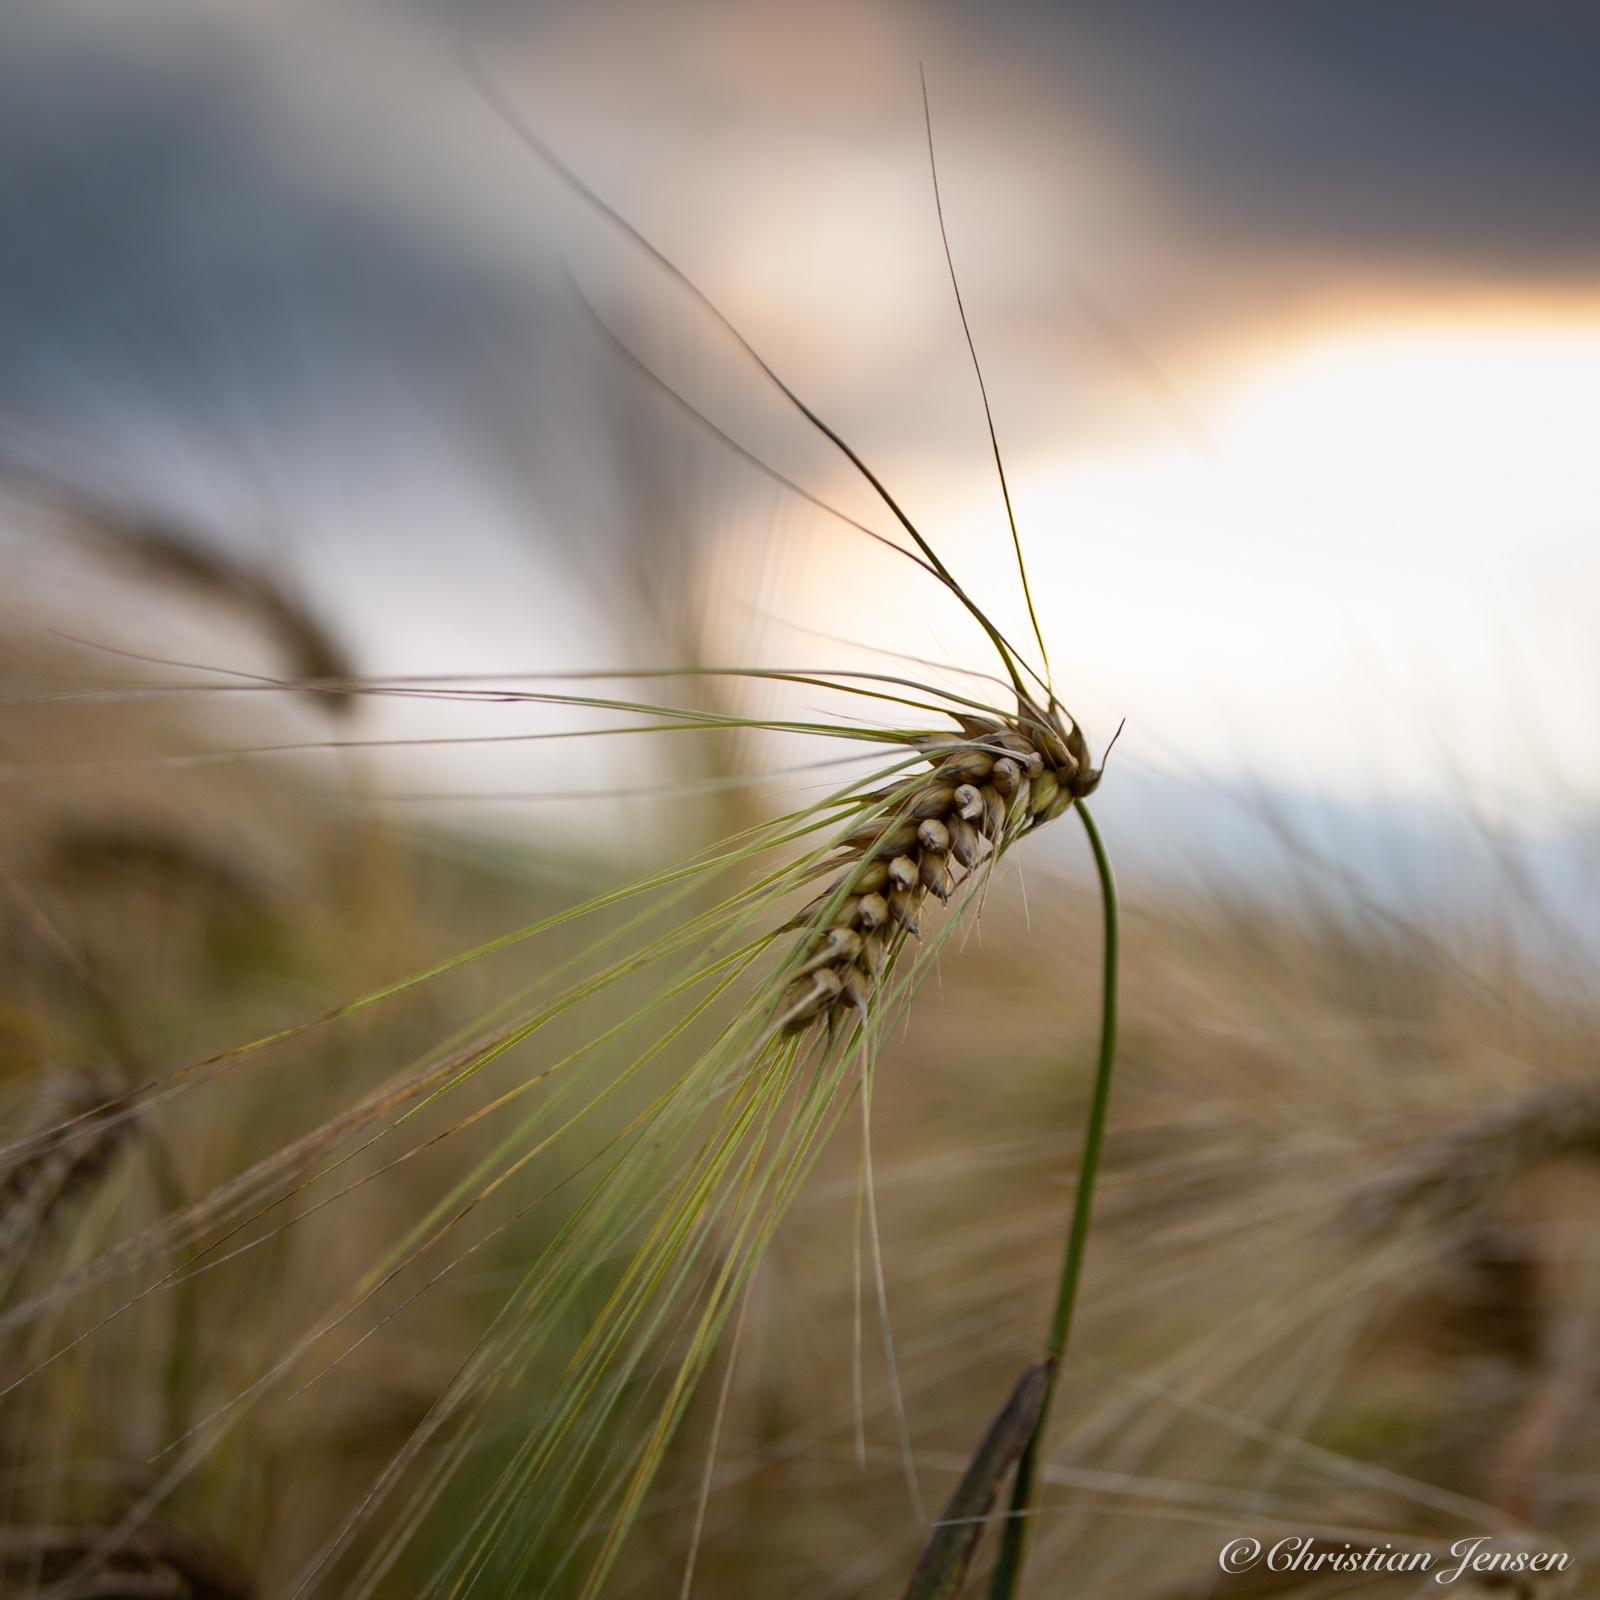 Details in the corn field